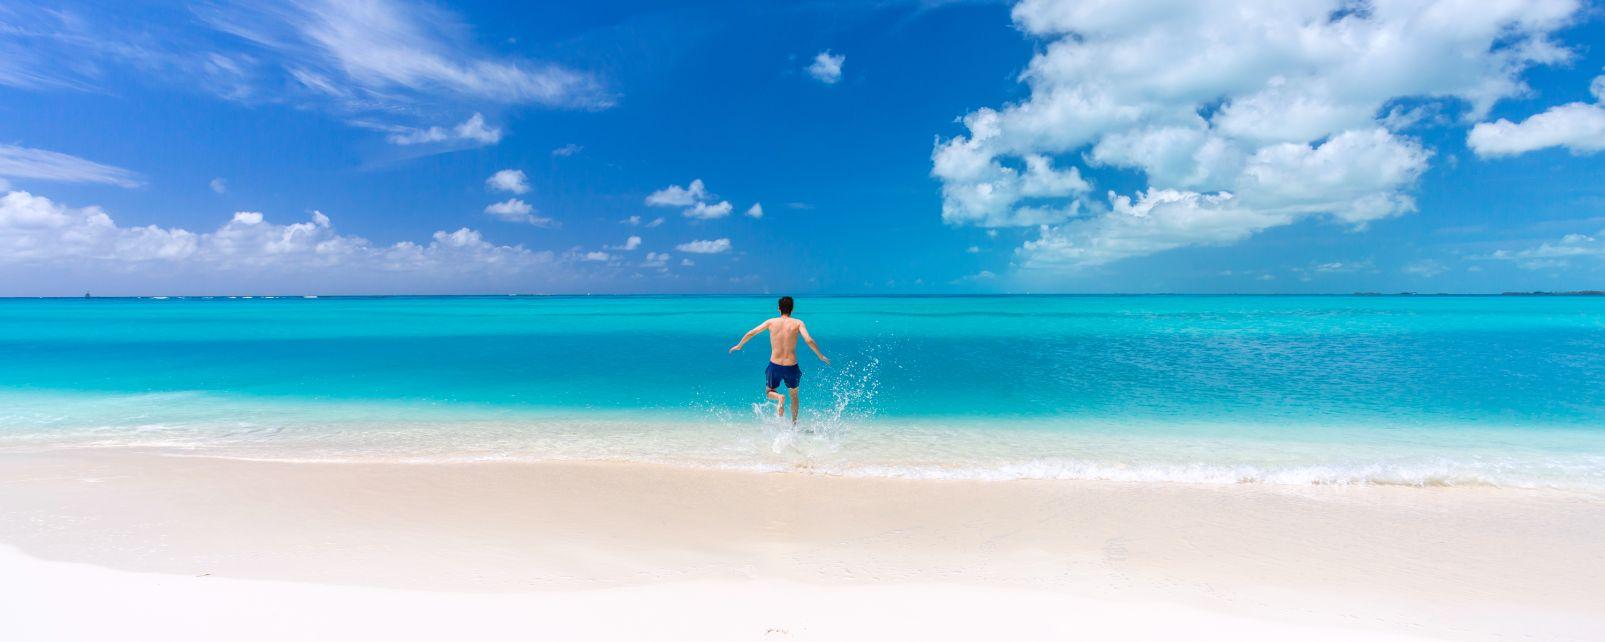 The beaches of Cayos, Cuba, The beaches of Cayos, Coasts, Cuba